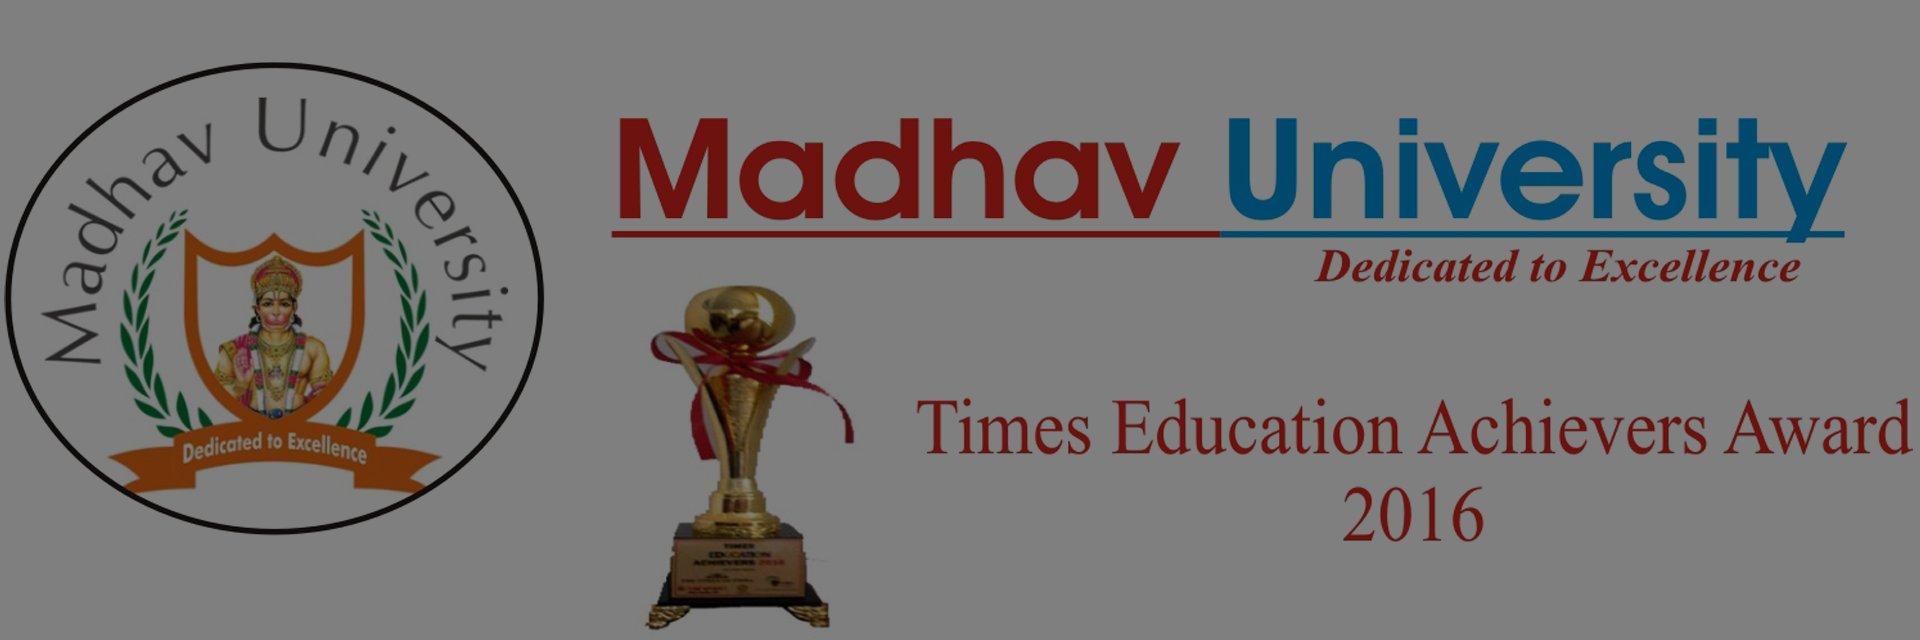 Madhav University's official Twitter account